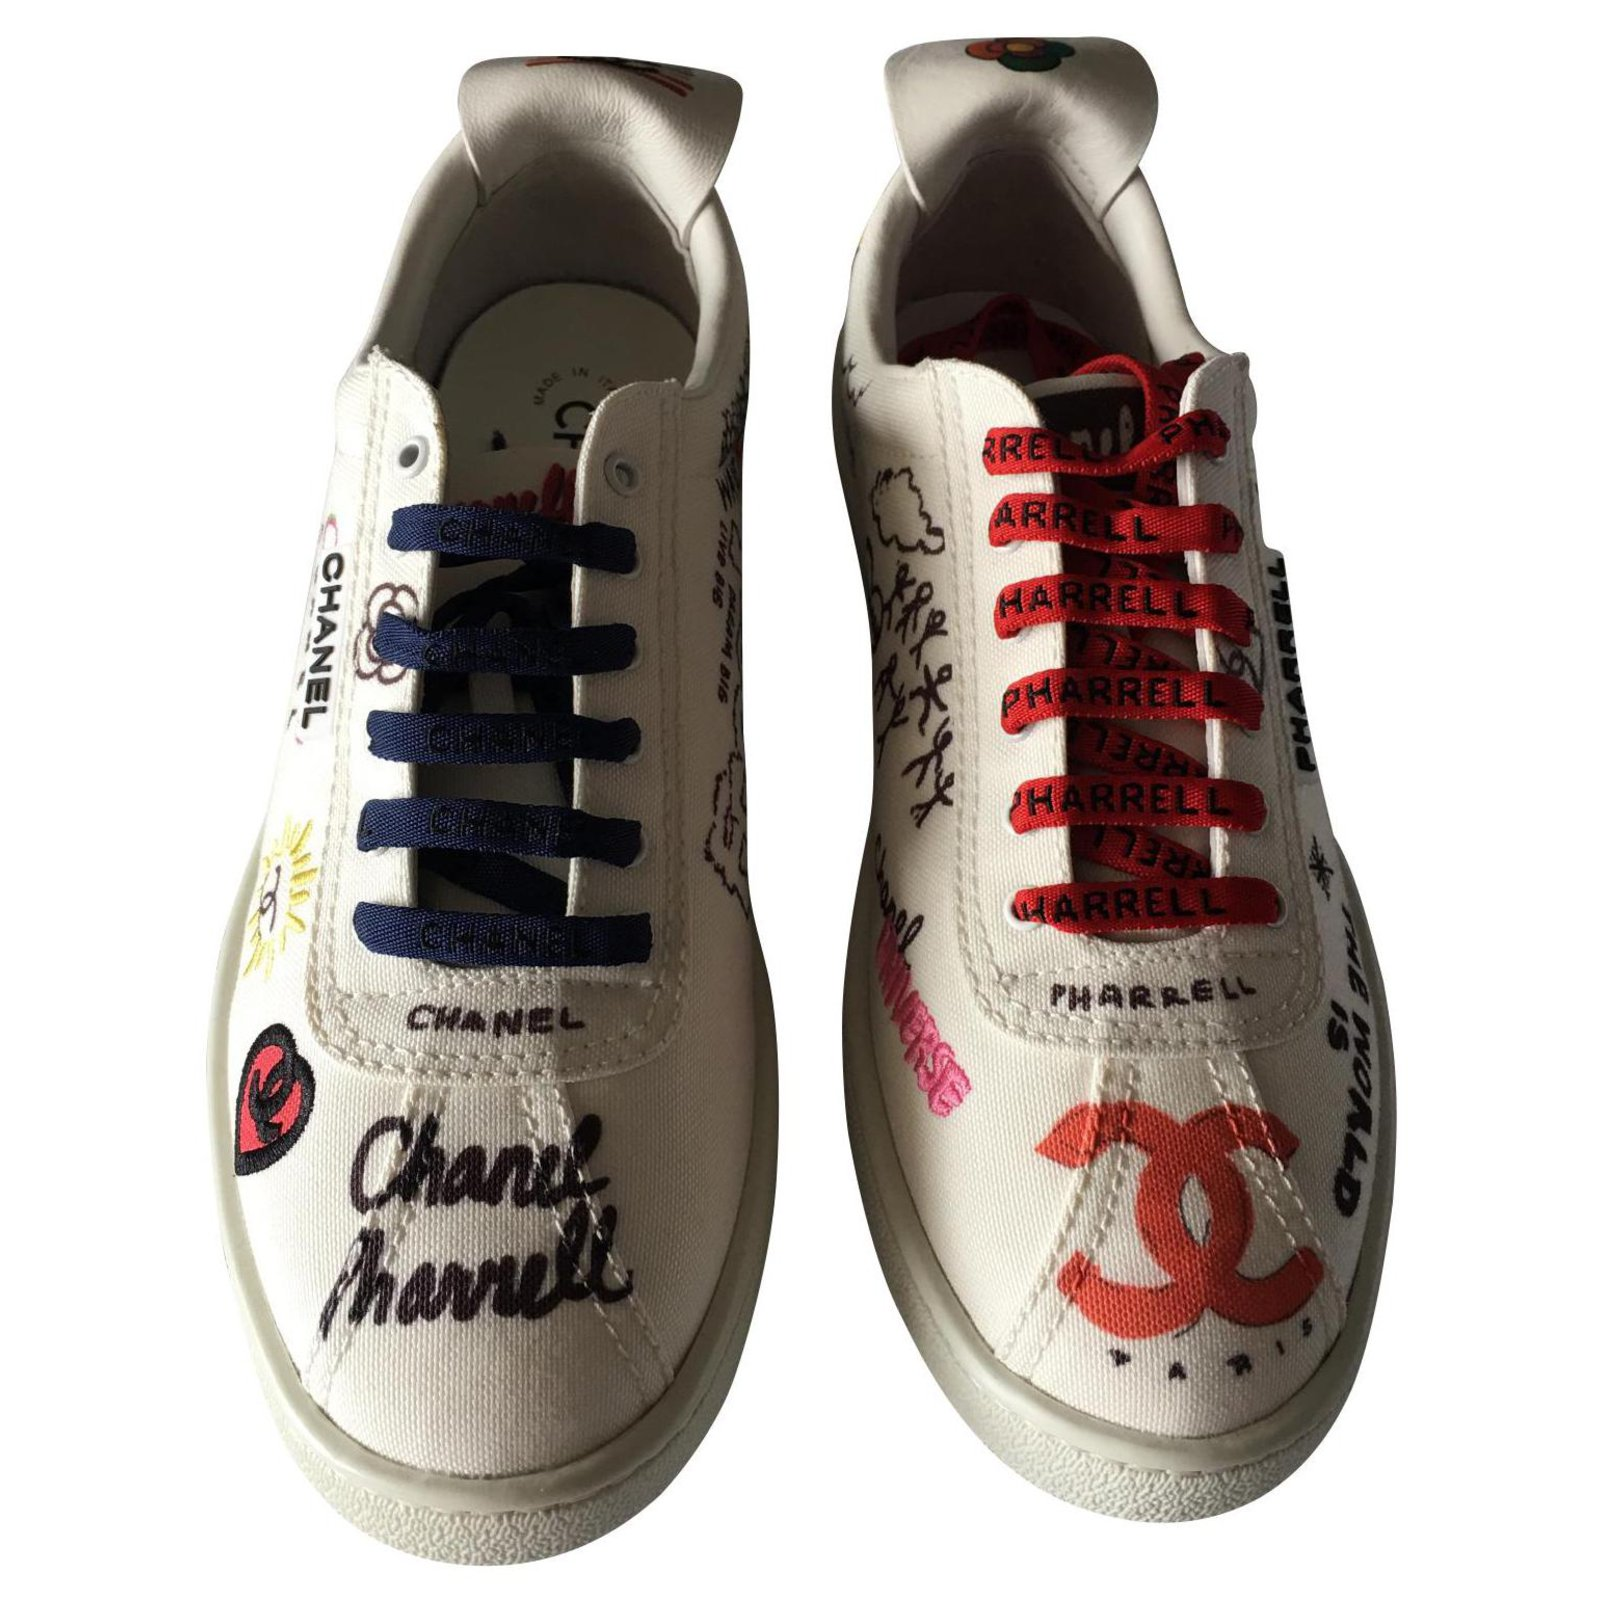 Chanel Chanel x Pharell Williams